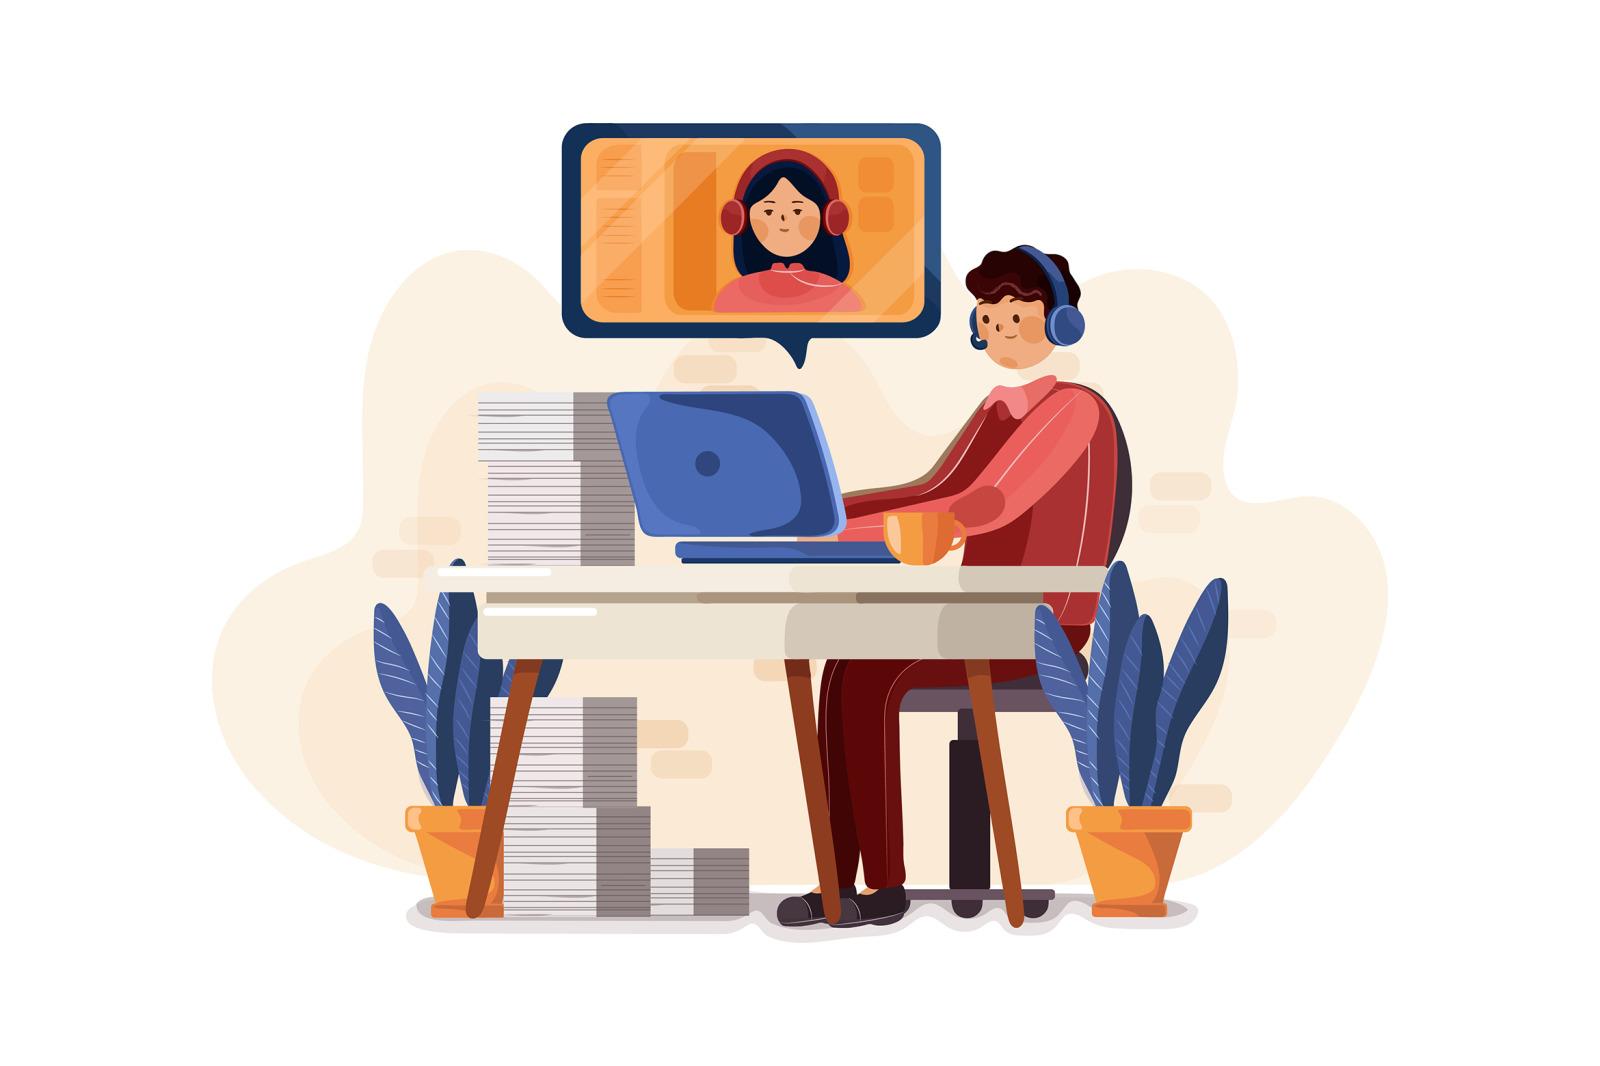 M183_Business Illustrations